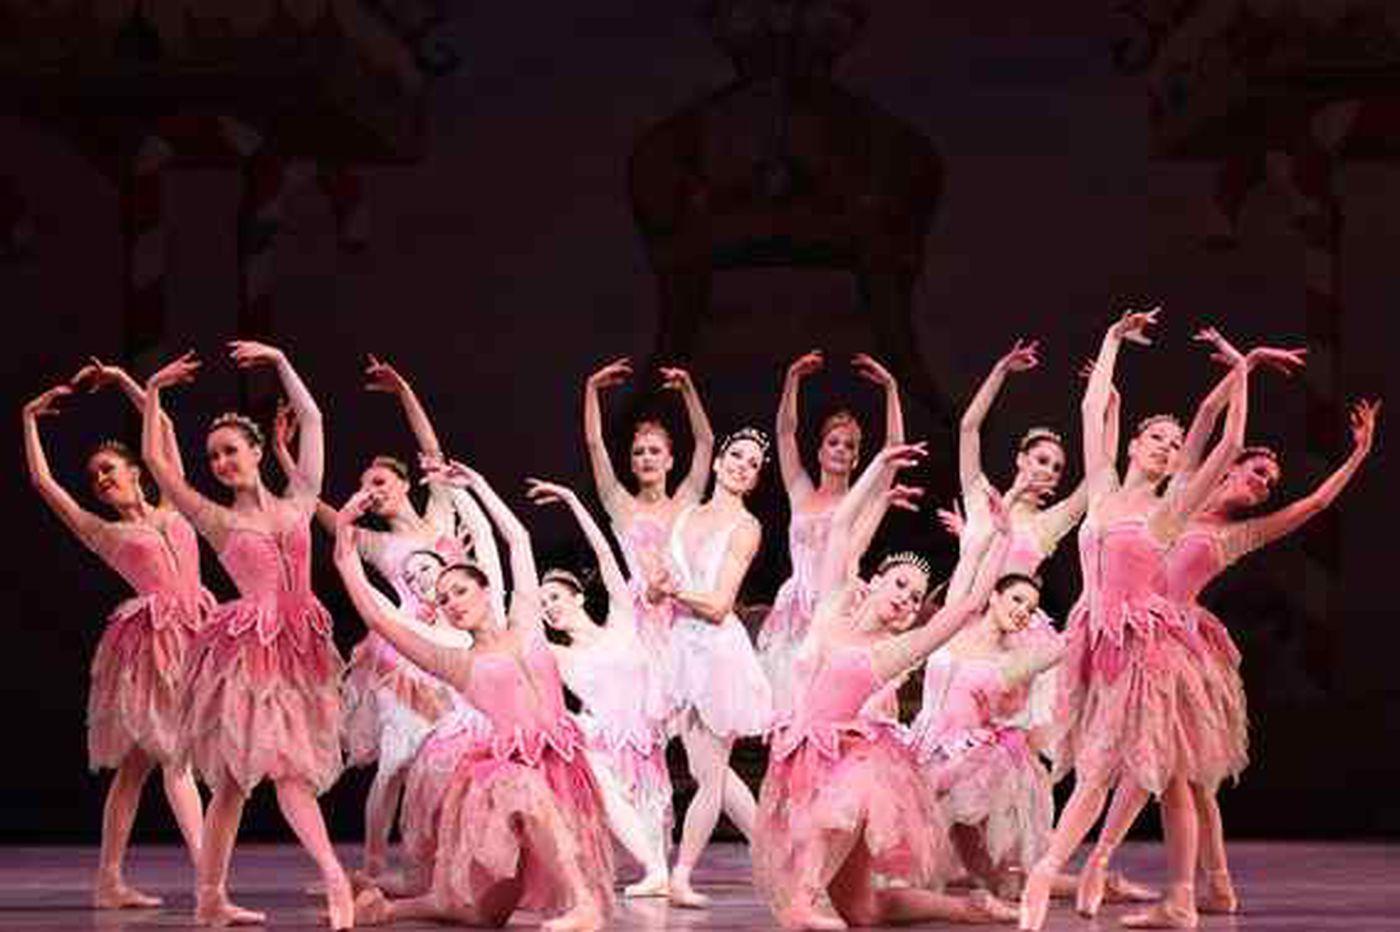 Stage magic, fine dancing in Pa. Ballet's 'Nutcracker'